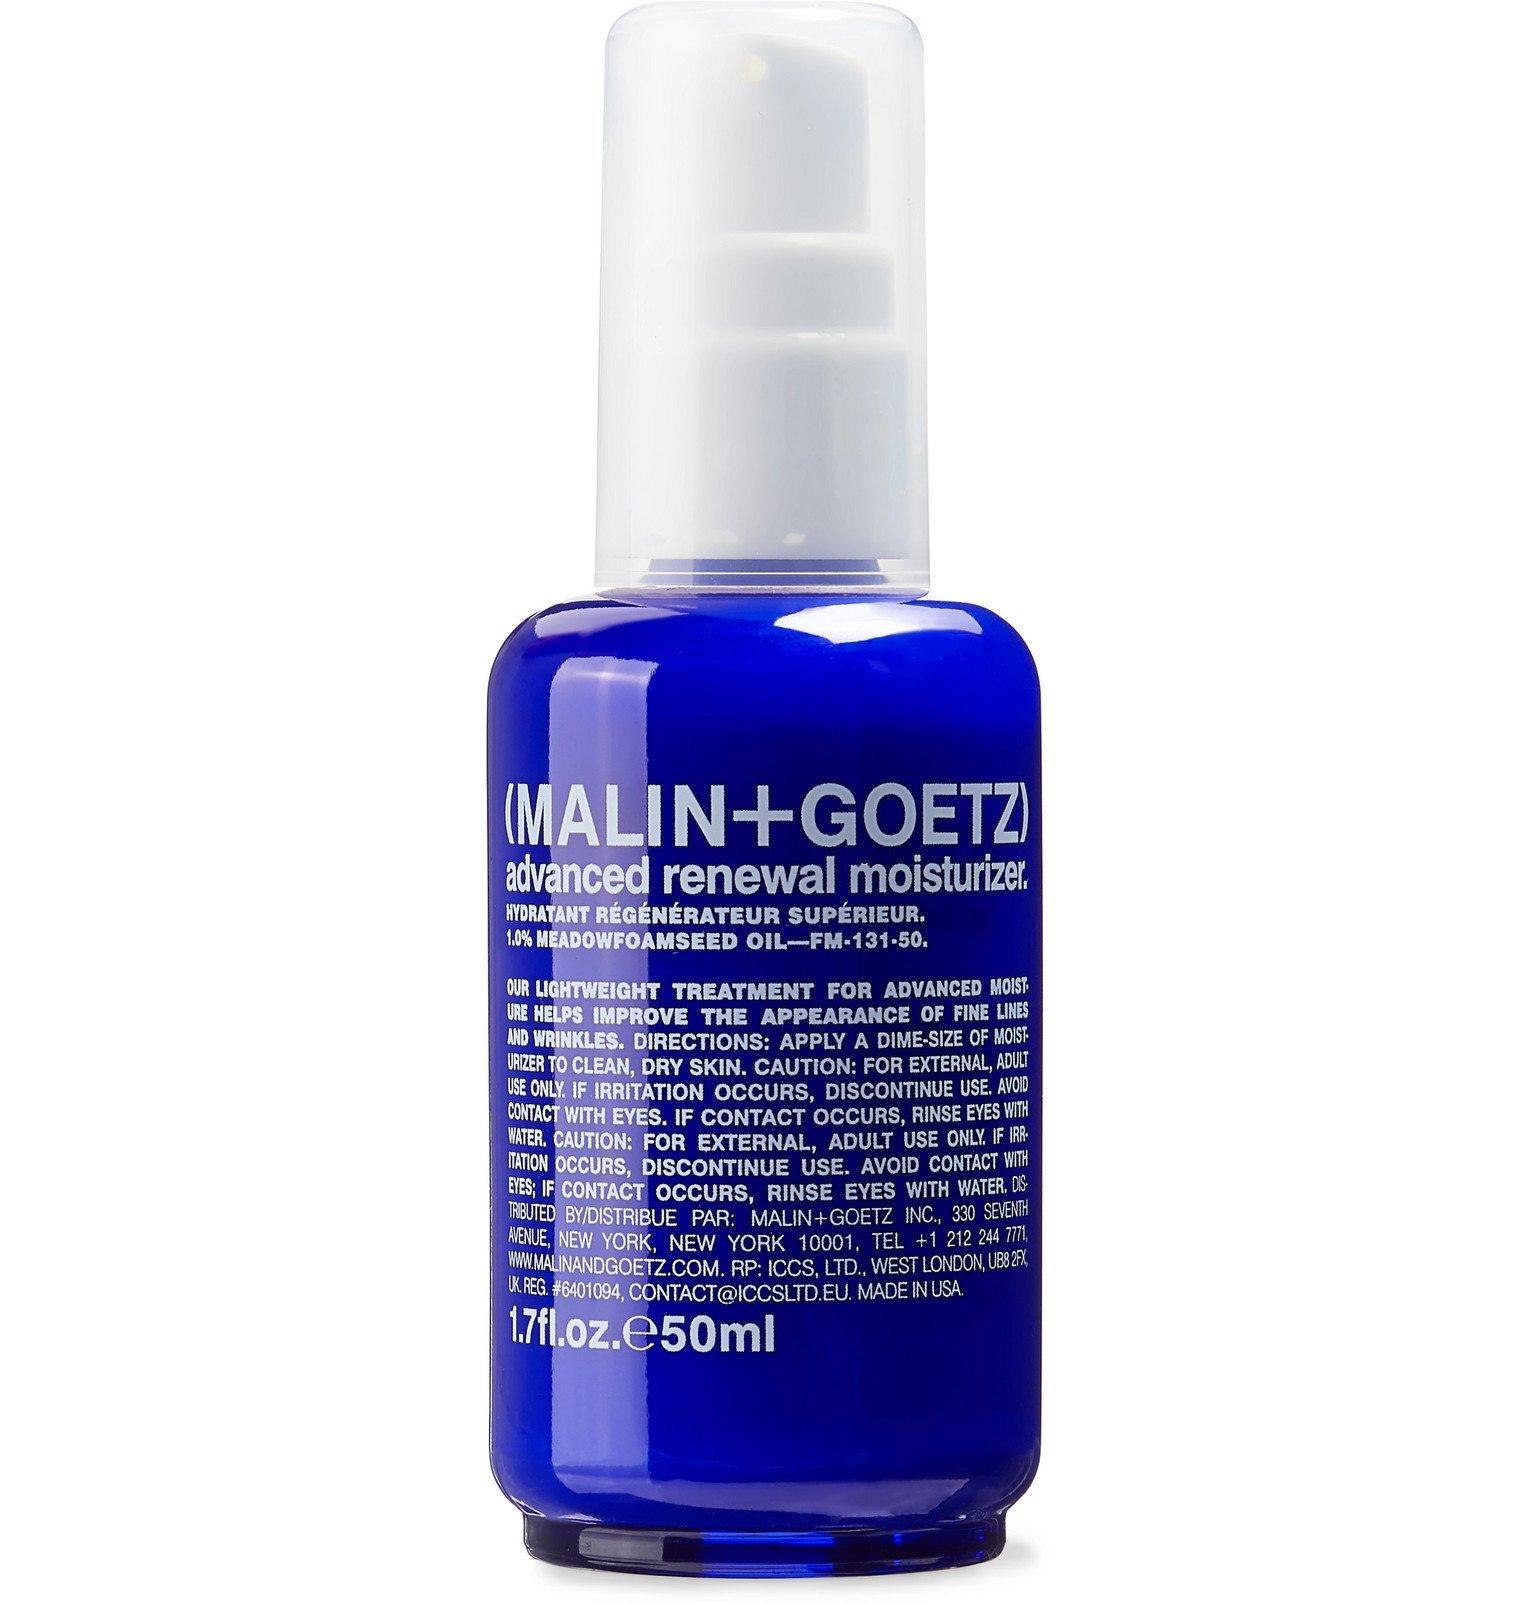 Photo: Malin Goetz - Advanced Renewal Moisturizer, 50ml - Colorless